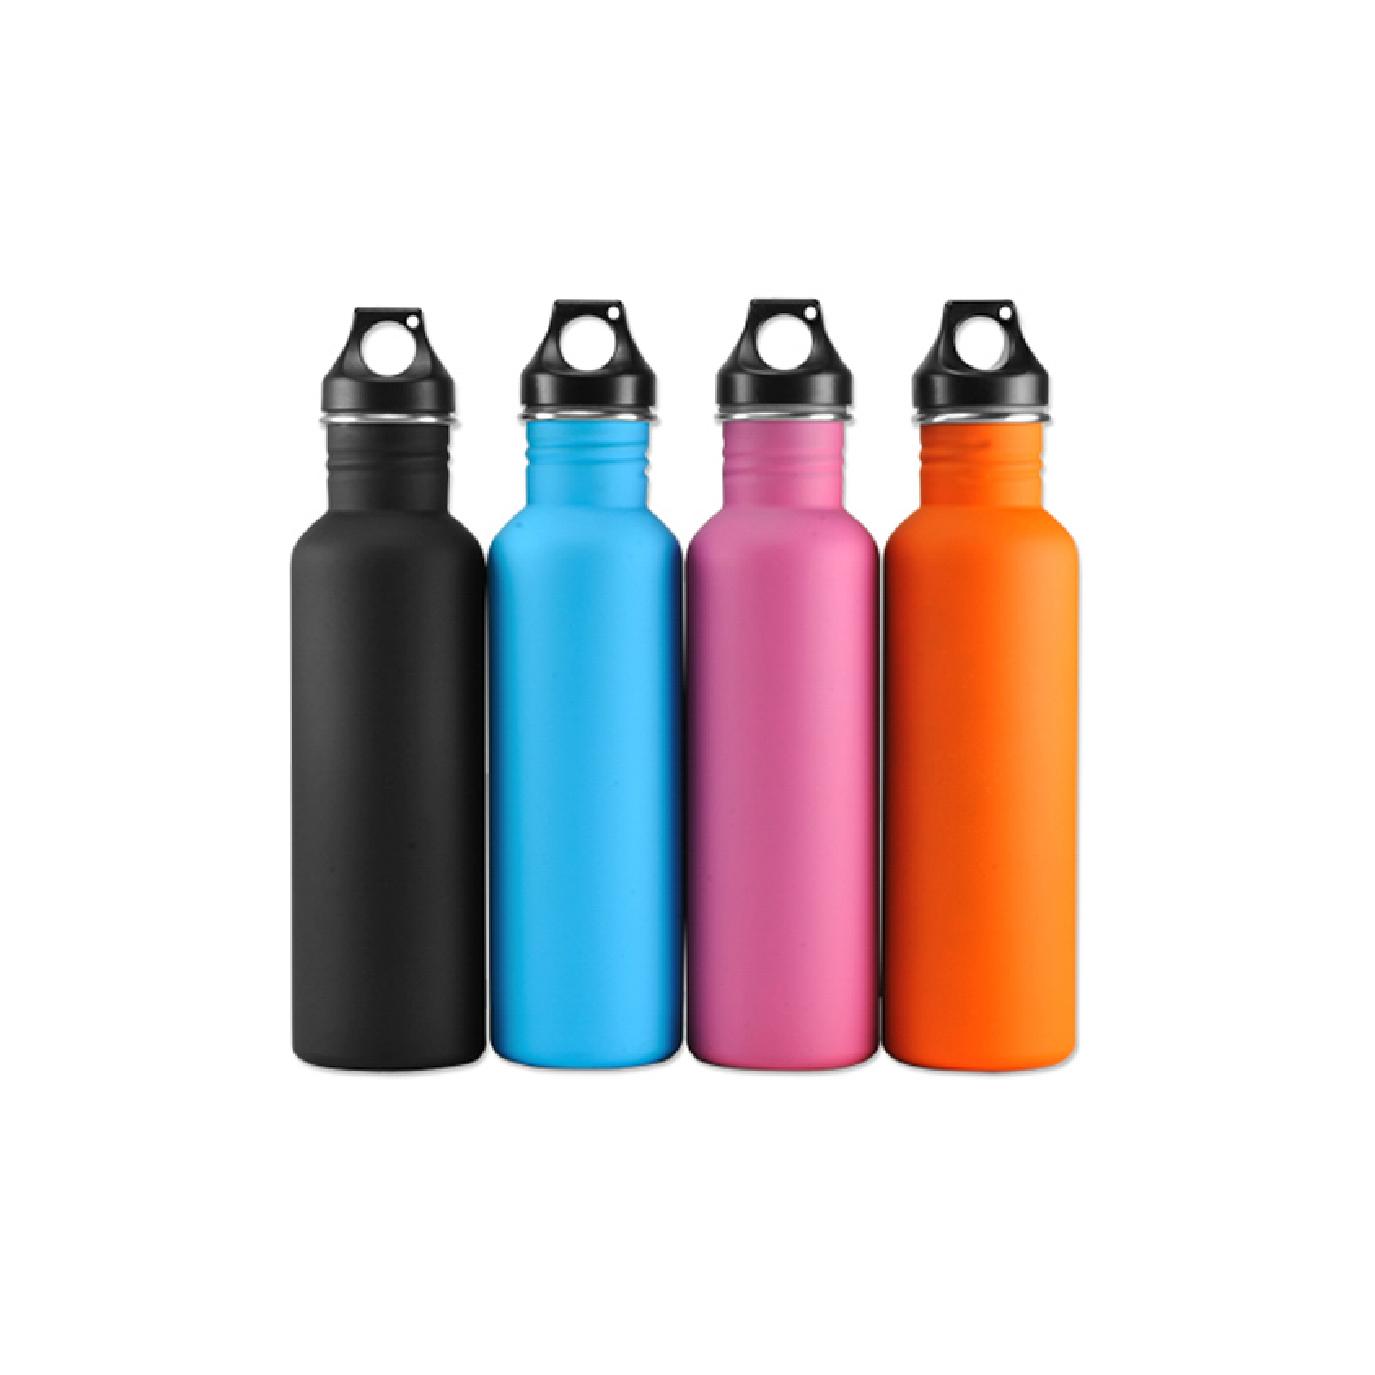 custom printed stainless steel bottles